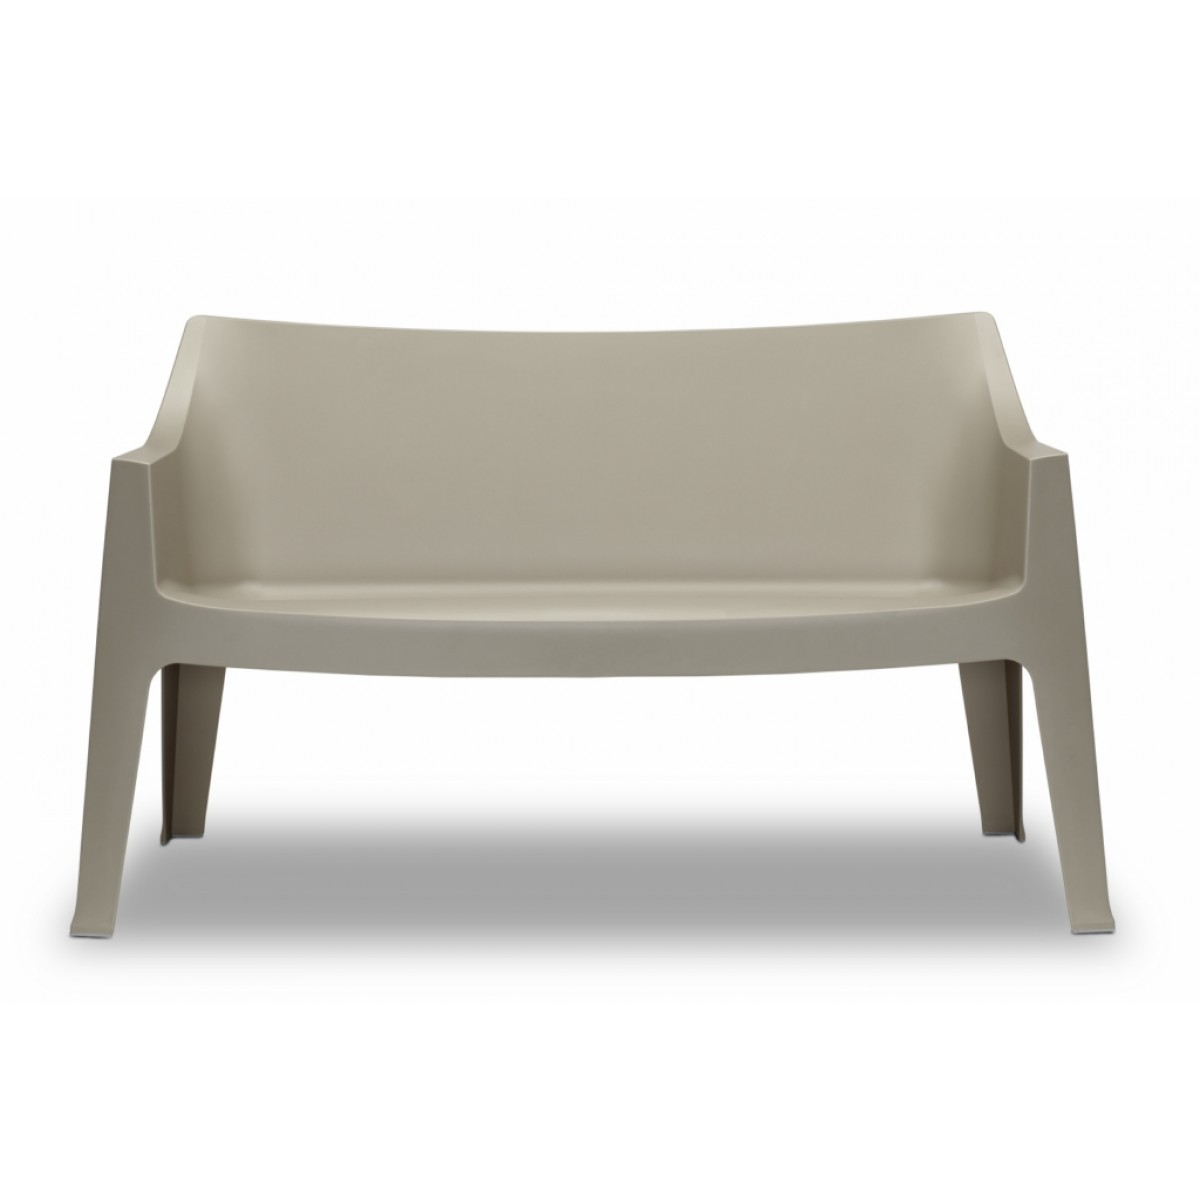 Design Stuhl  Sessel aus Kunststoff Outdoor